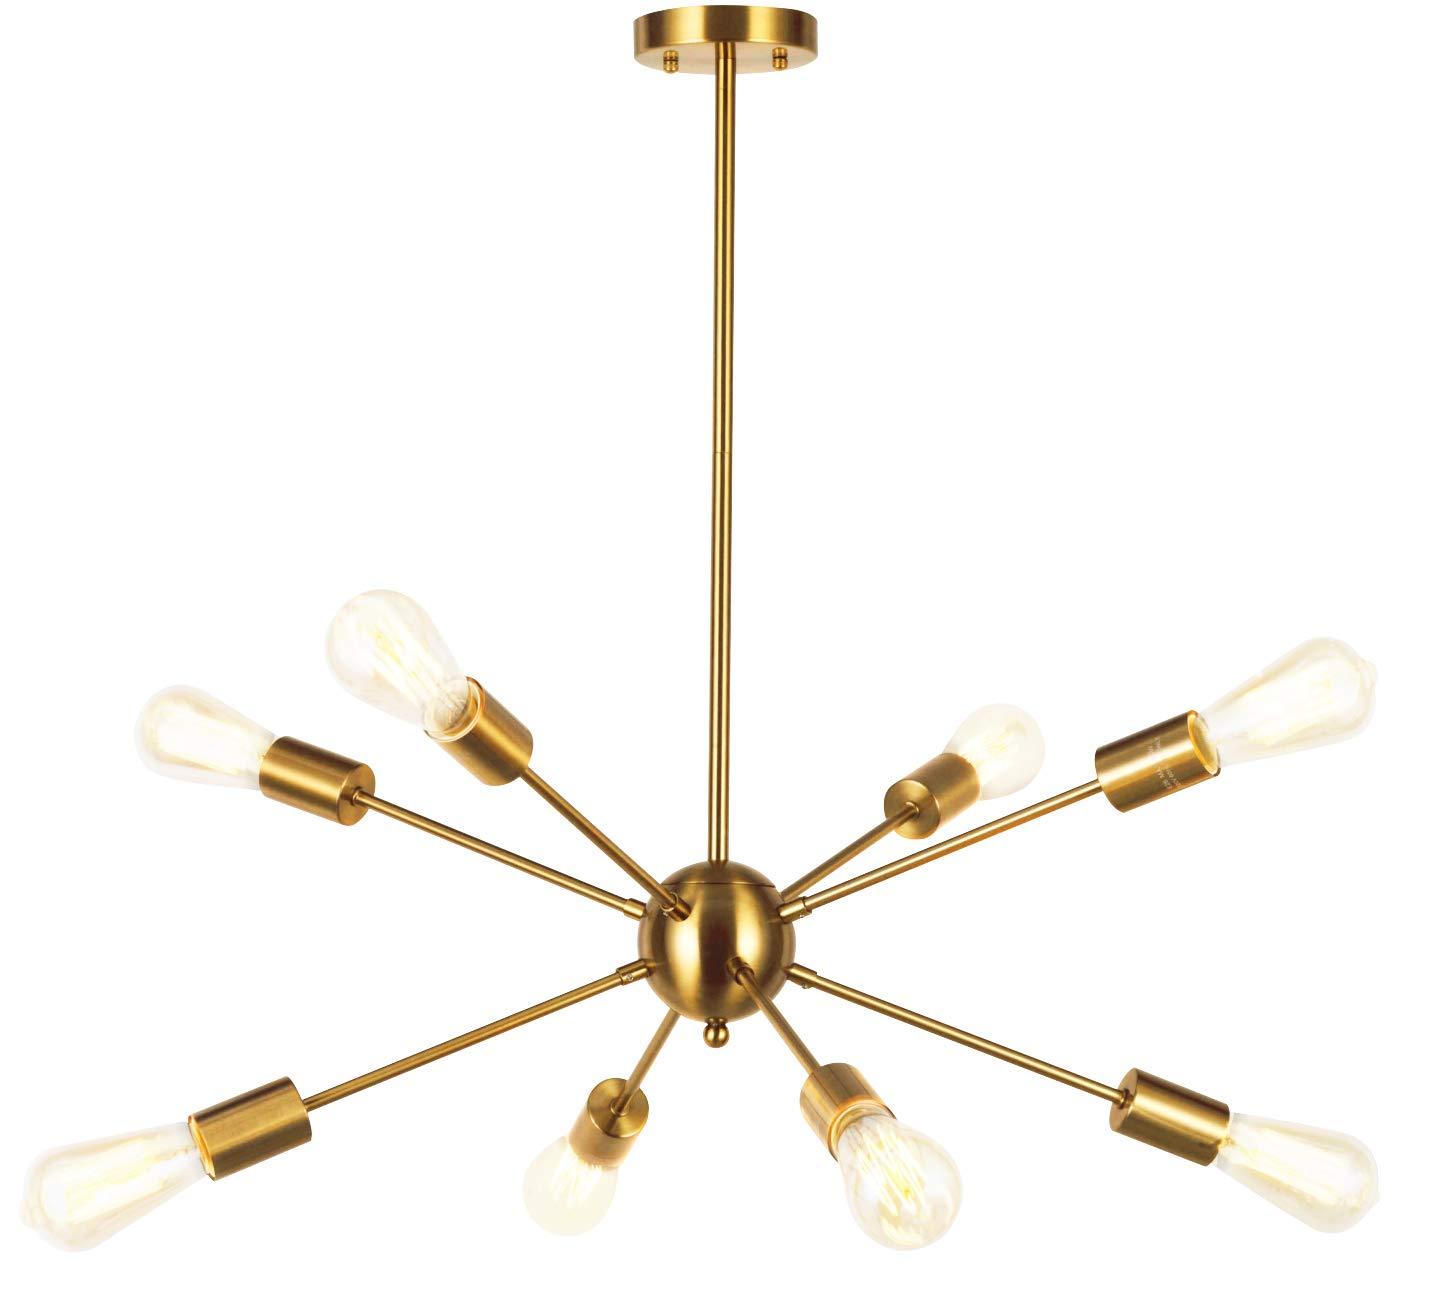 Vinluz sputnik chandelier contemporary 8 lights brushed brass modern pendant lighting gold mid century ceiling light fixture for dining room bed room